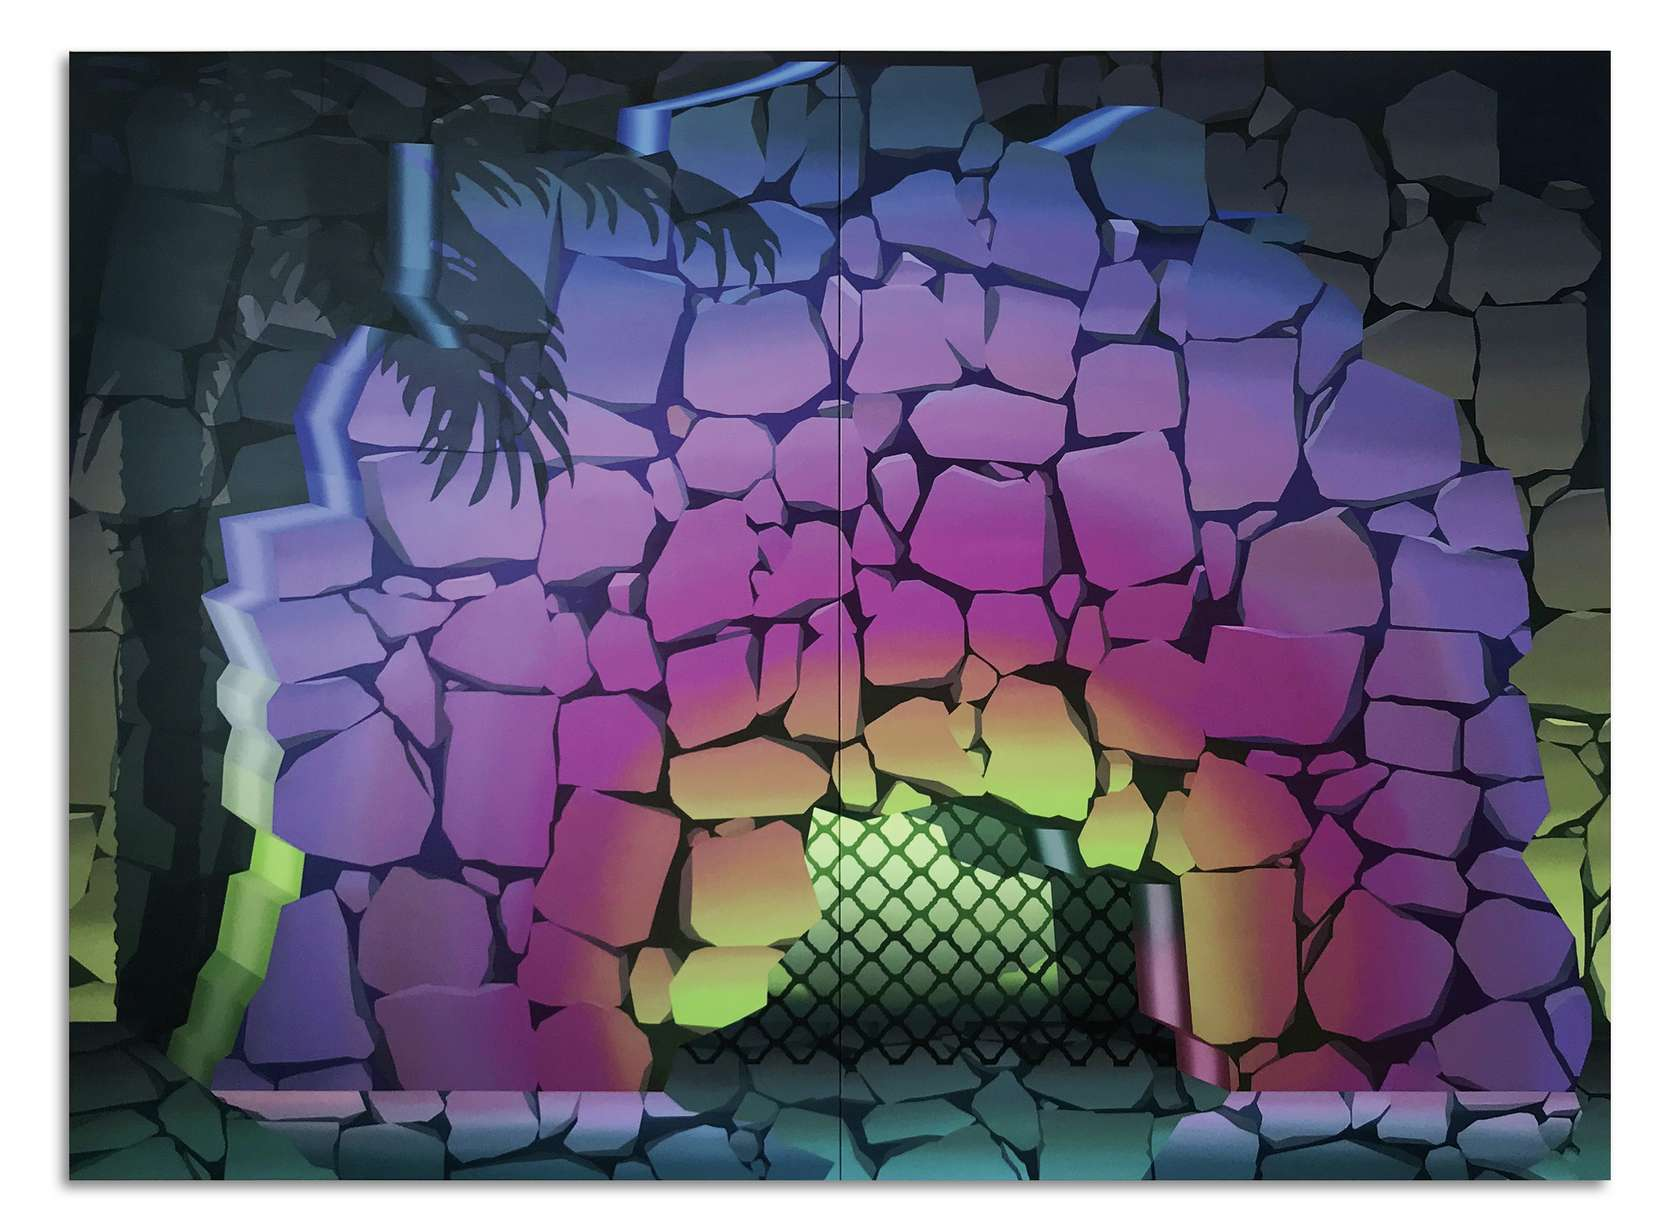 Amélie Bertrand, From Dusk Till Dawn, 2019 Huile sur toile (diptyque)220 x 300 x 4.5 cm / 86 5/8 x 118 1/8 x 17 6/8 inches220 x 150 x 4.5 cm / 86 5/8 x 59  x 1 6/8 inches (chaque/each)